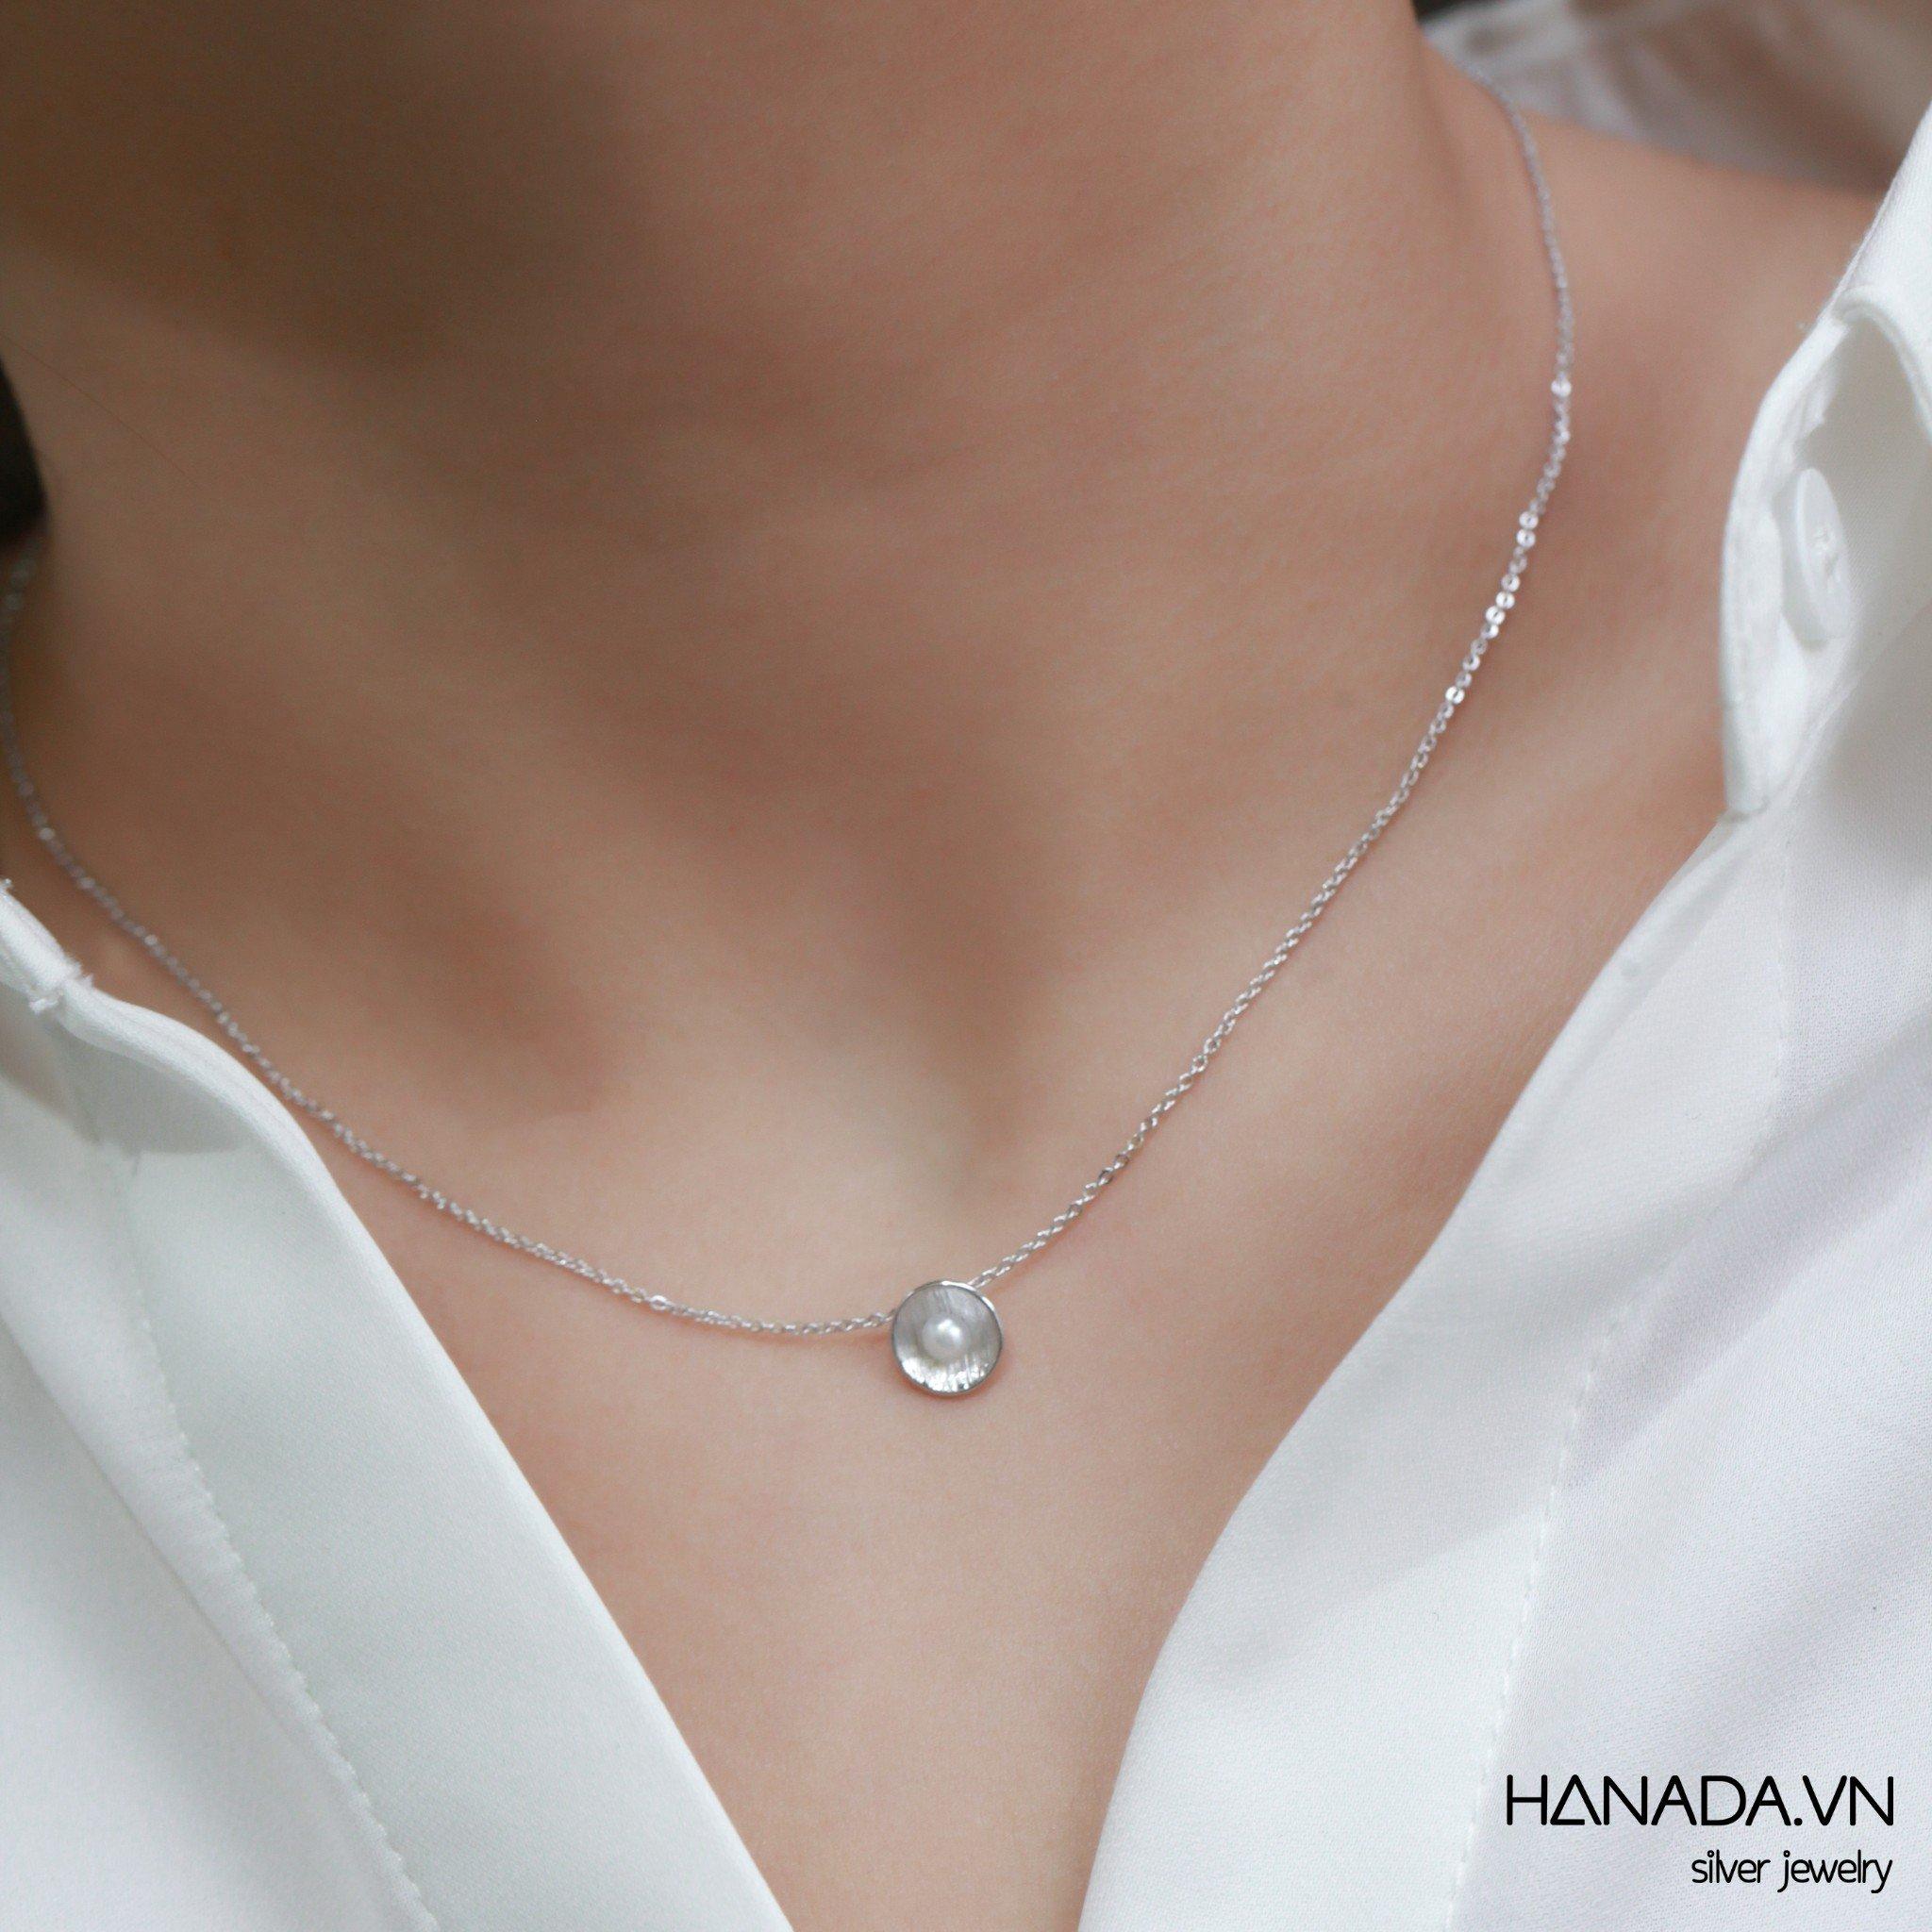 Dây Chuyền Bạc 925 Hanada N12.N.P.B.280.0531 Sò Ngọc Trai Nhỏ